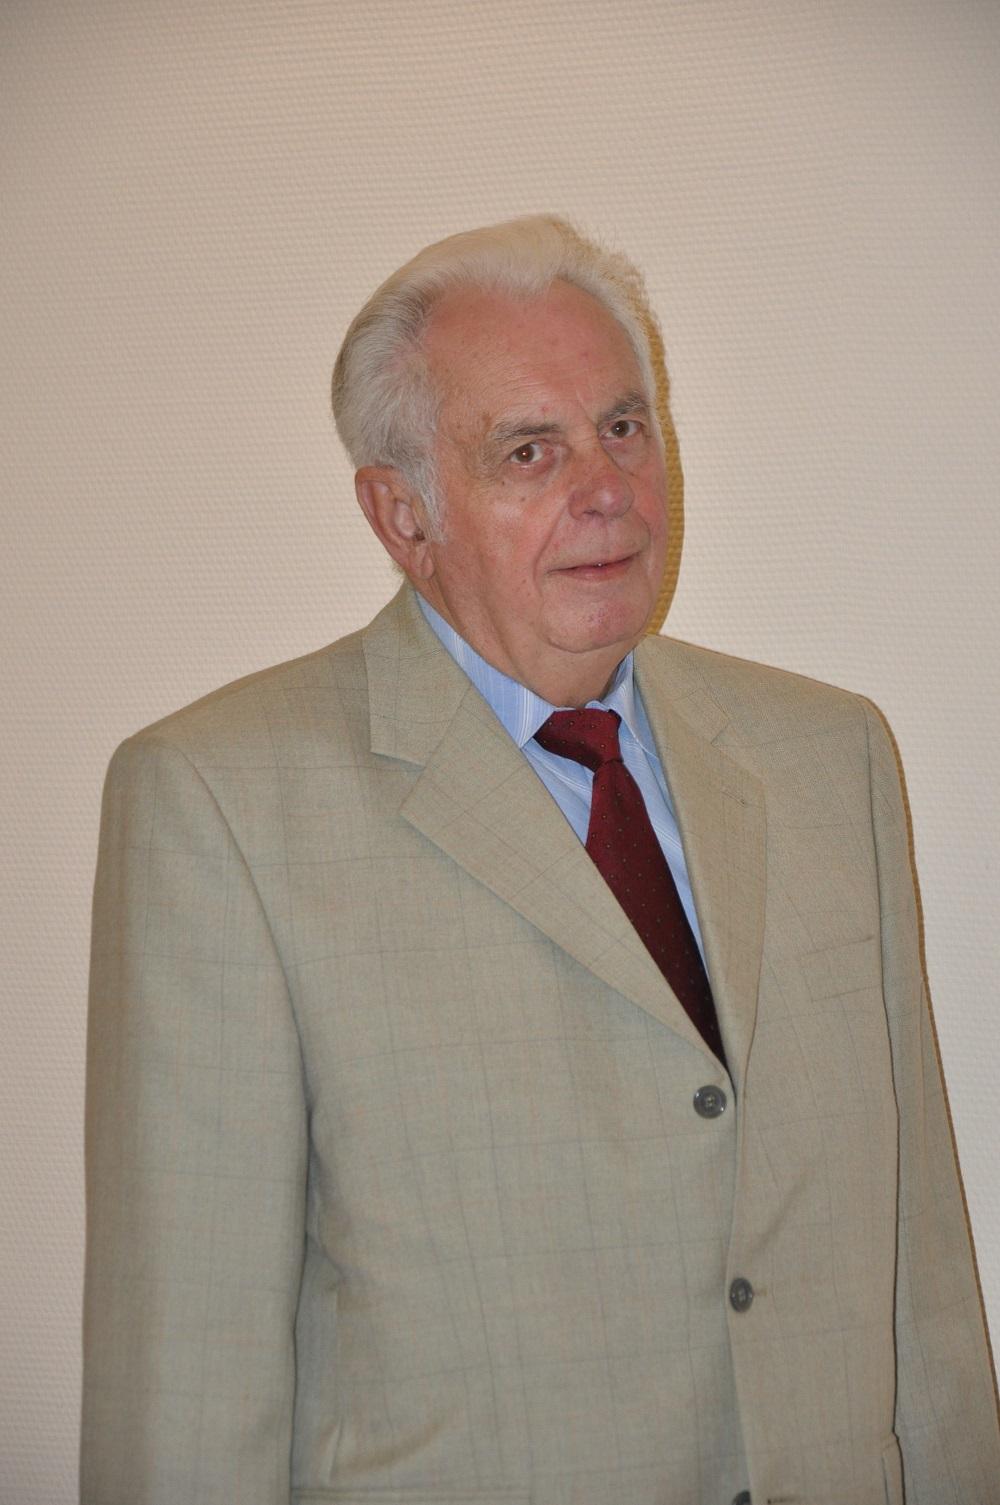 prof. dr hab. Czesław Skowronek